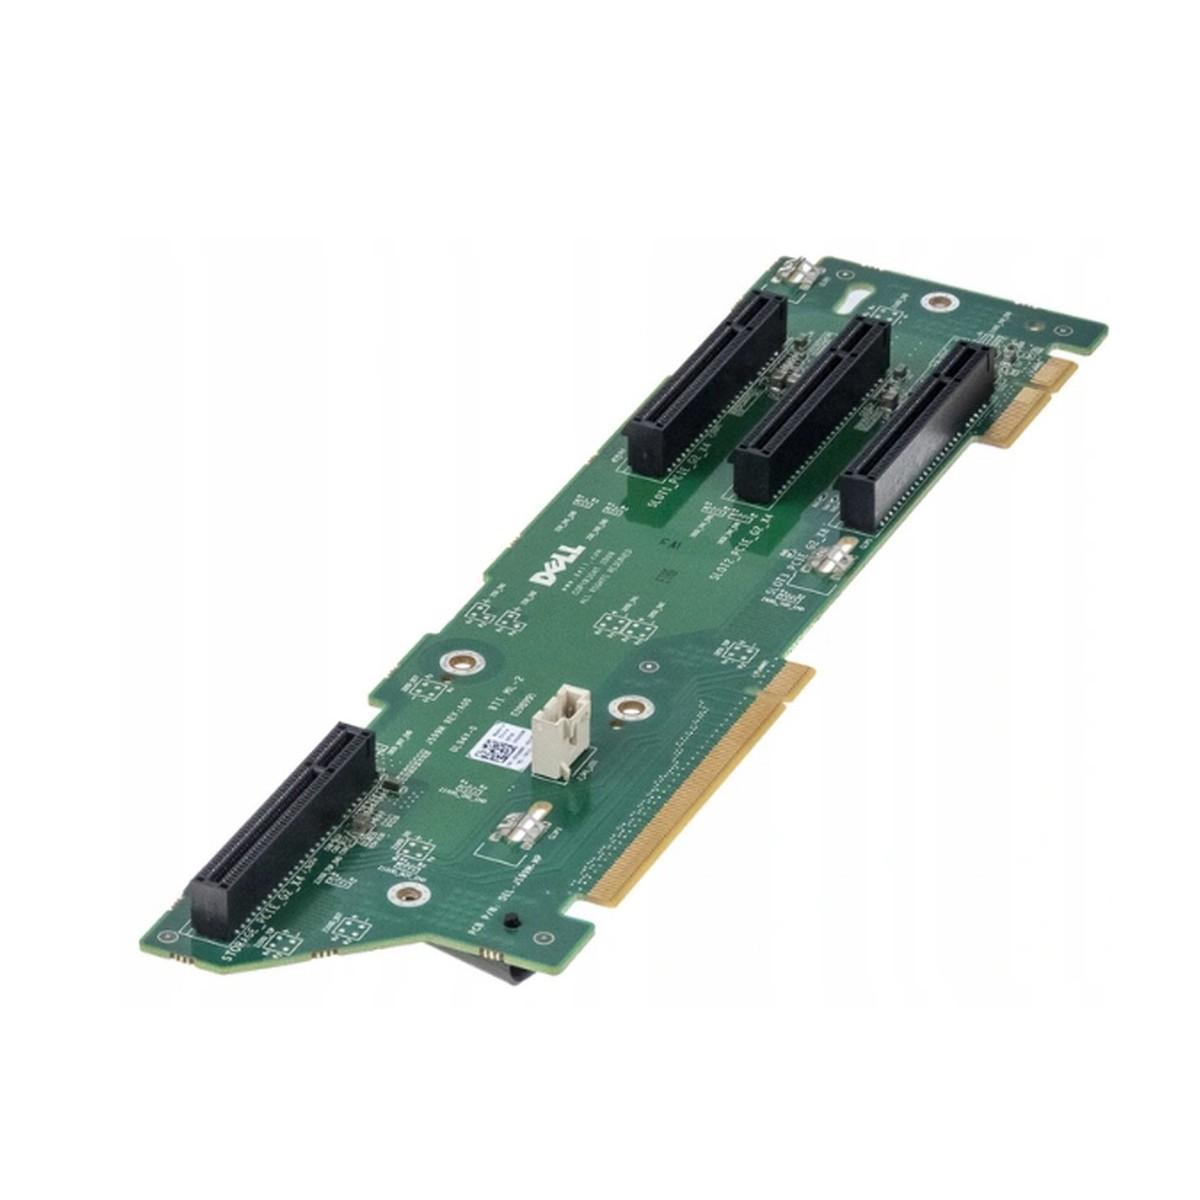 IBM RAID 5 KEY DLA M1015 LSI 9220-8i L3-25150-00A